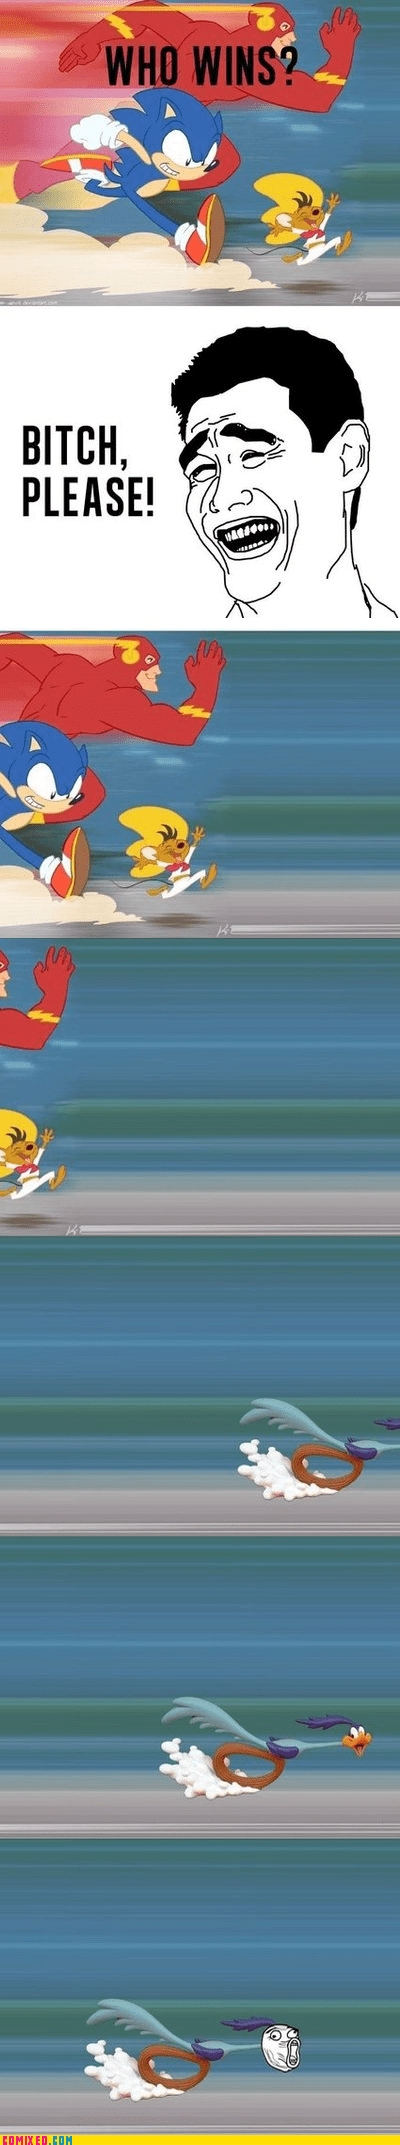 cartoons,flash,roadrunner,sonic,speedy gonzales